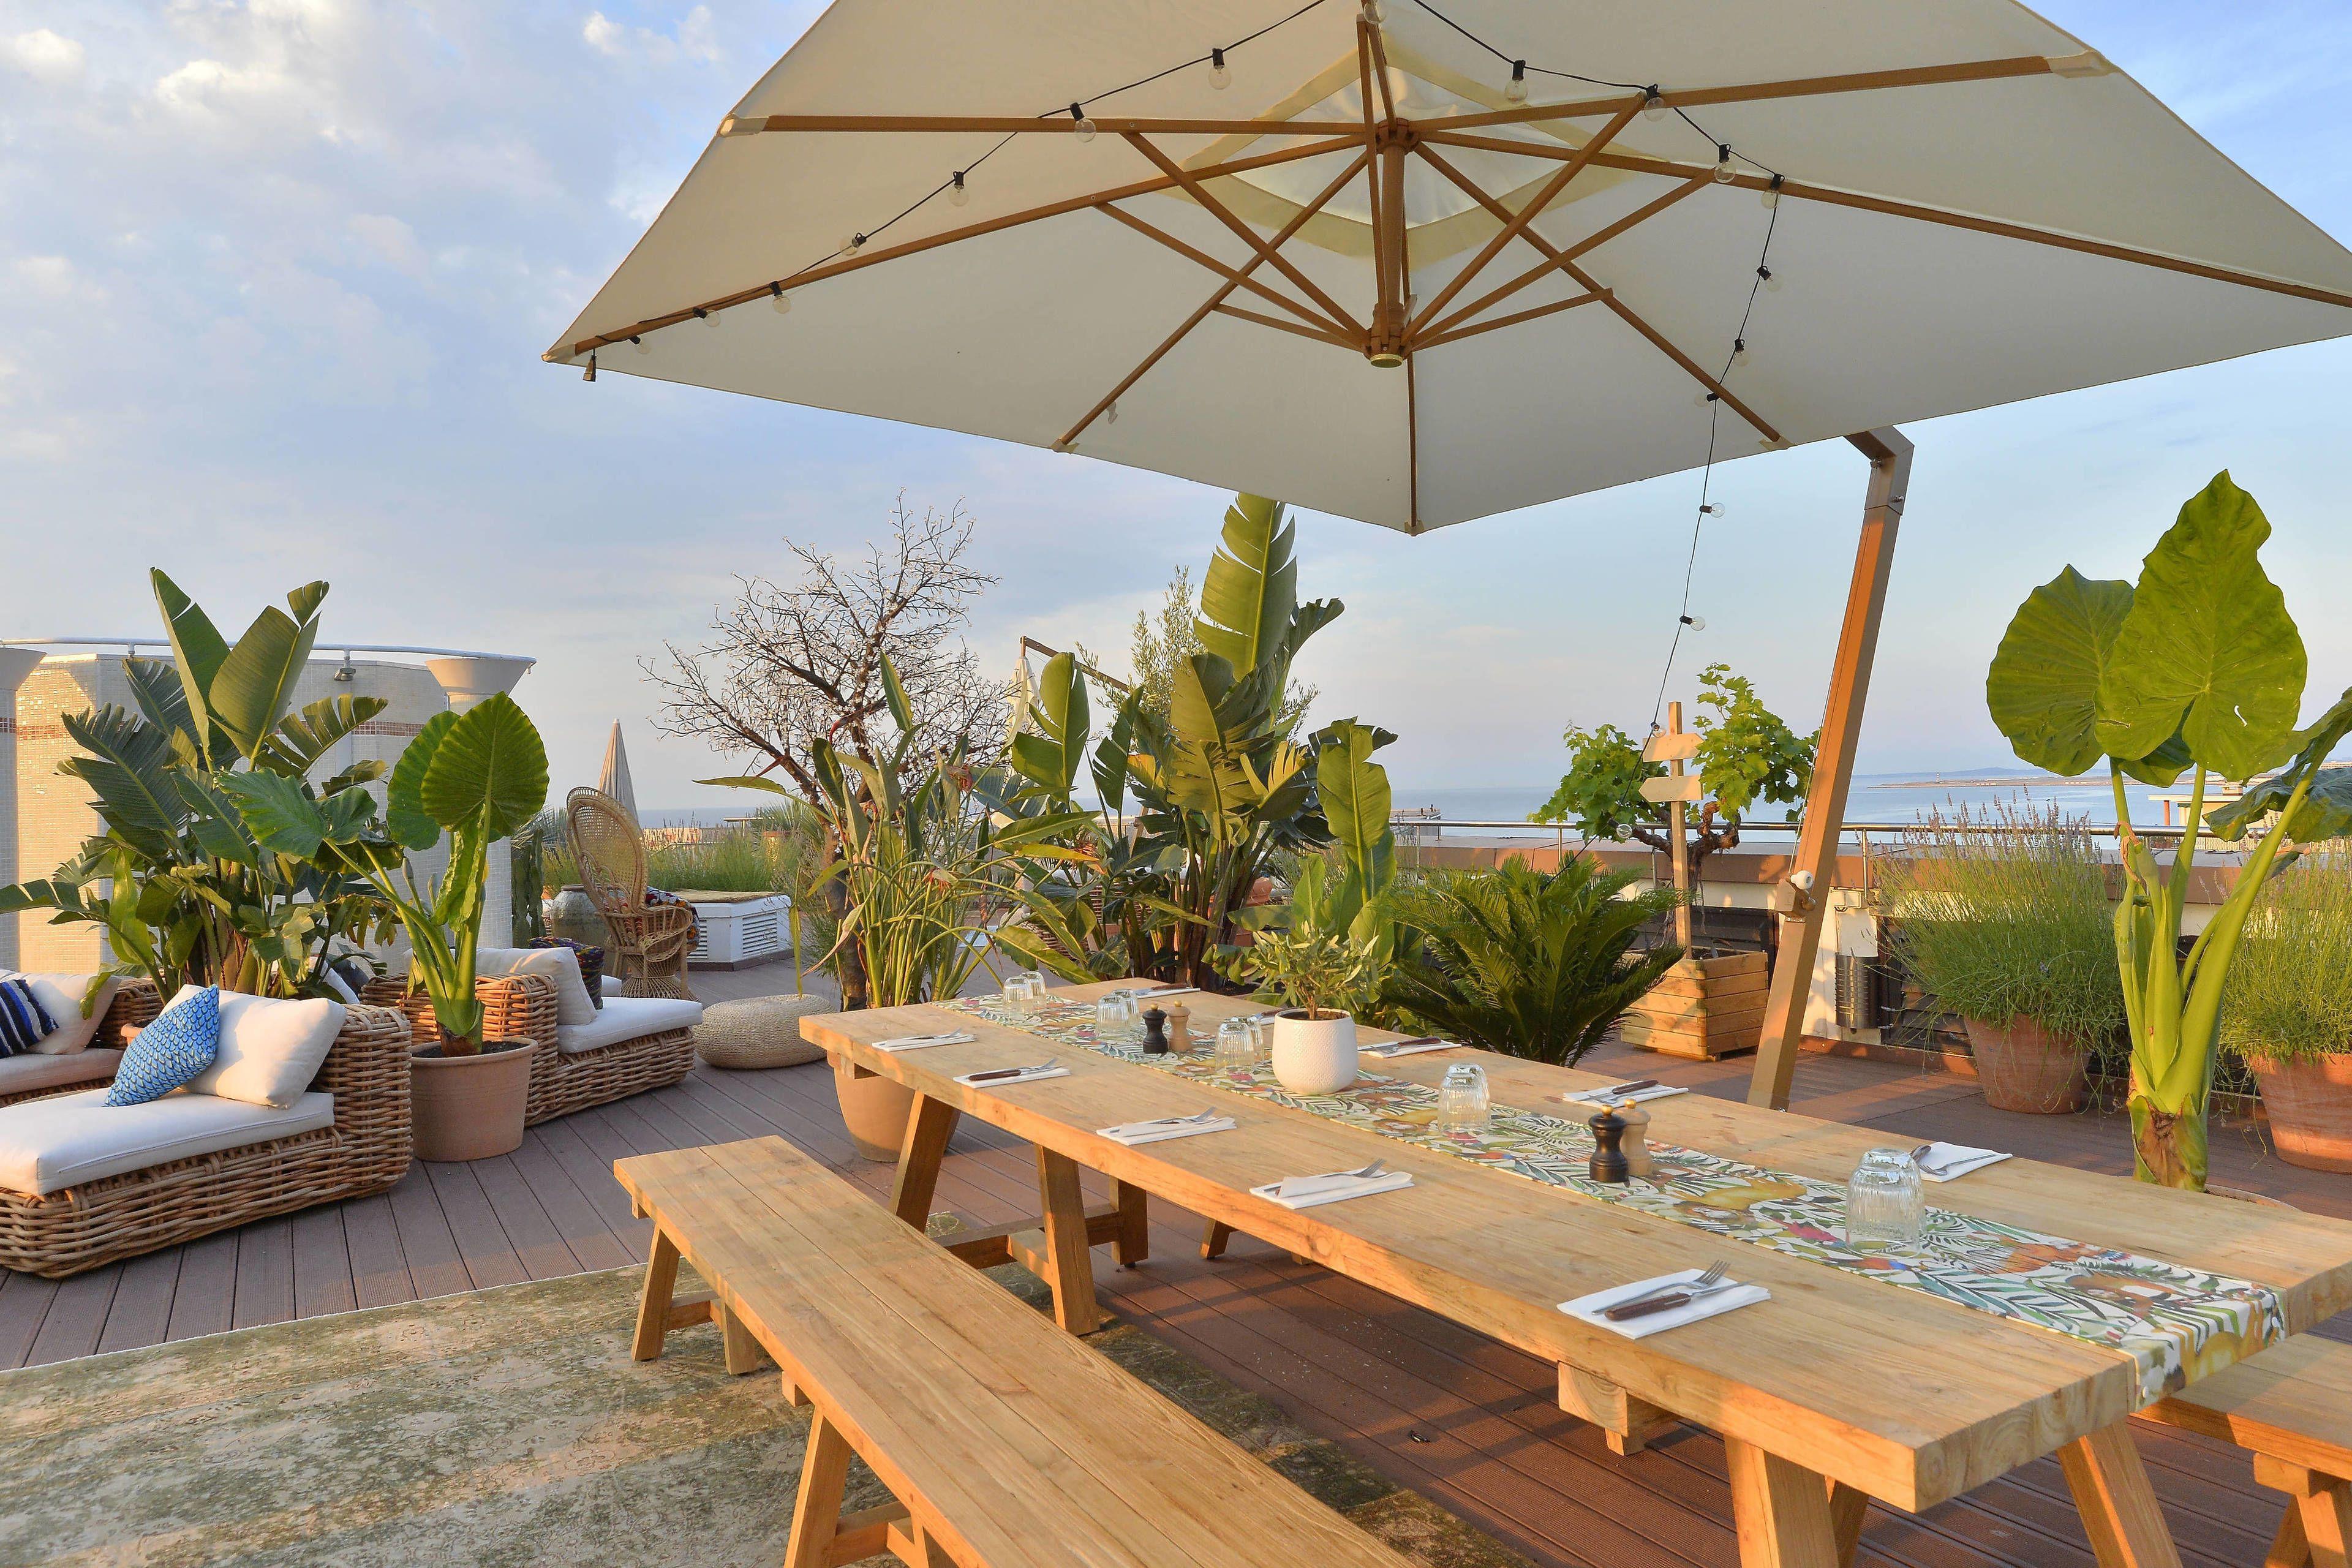 Courtesy of AC Hotel by Marriott Nice / Expedia.com